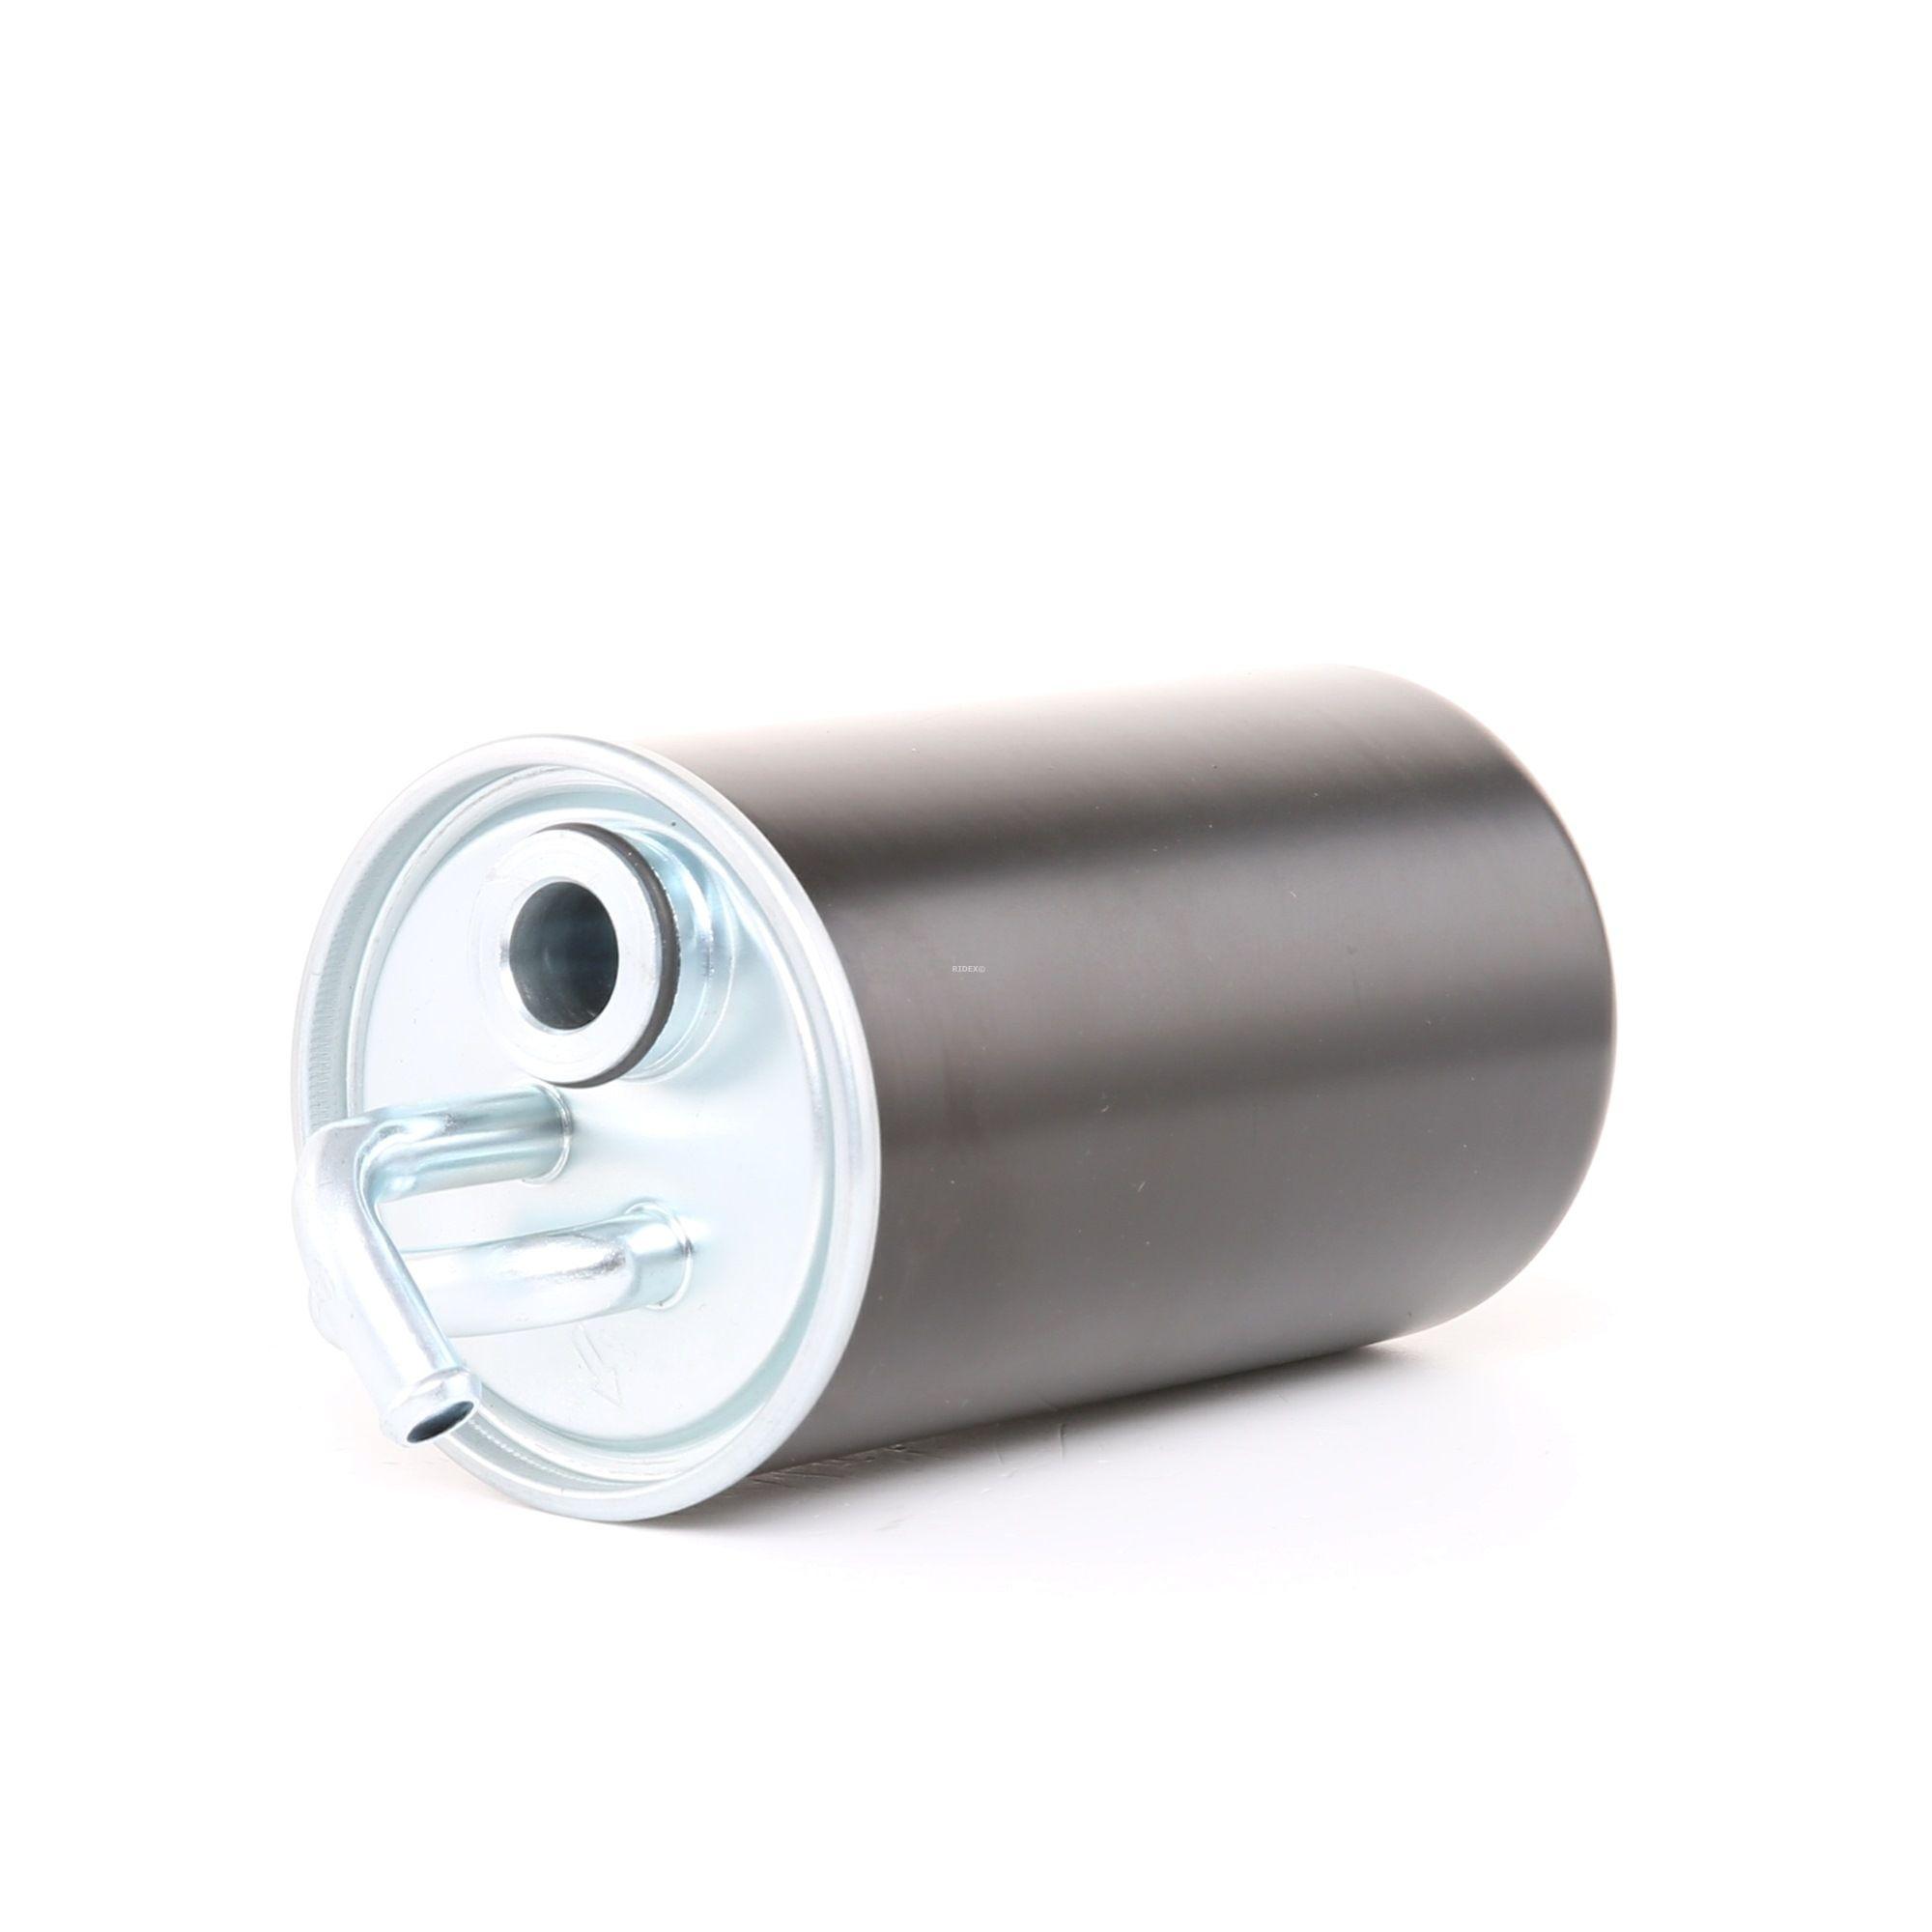 CHRYSLER Filtre à carburant d'Origine 9F0154